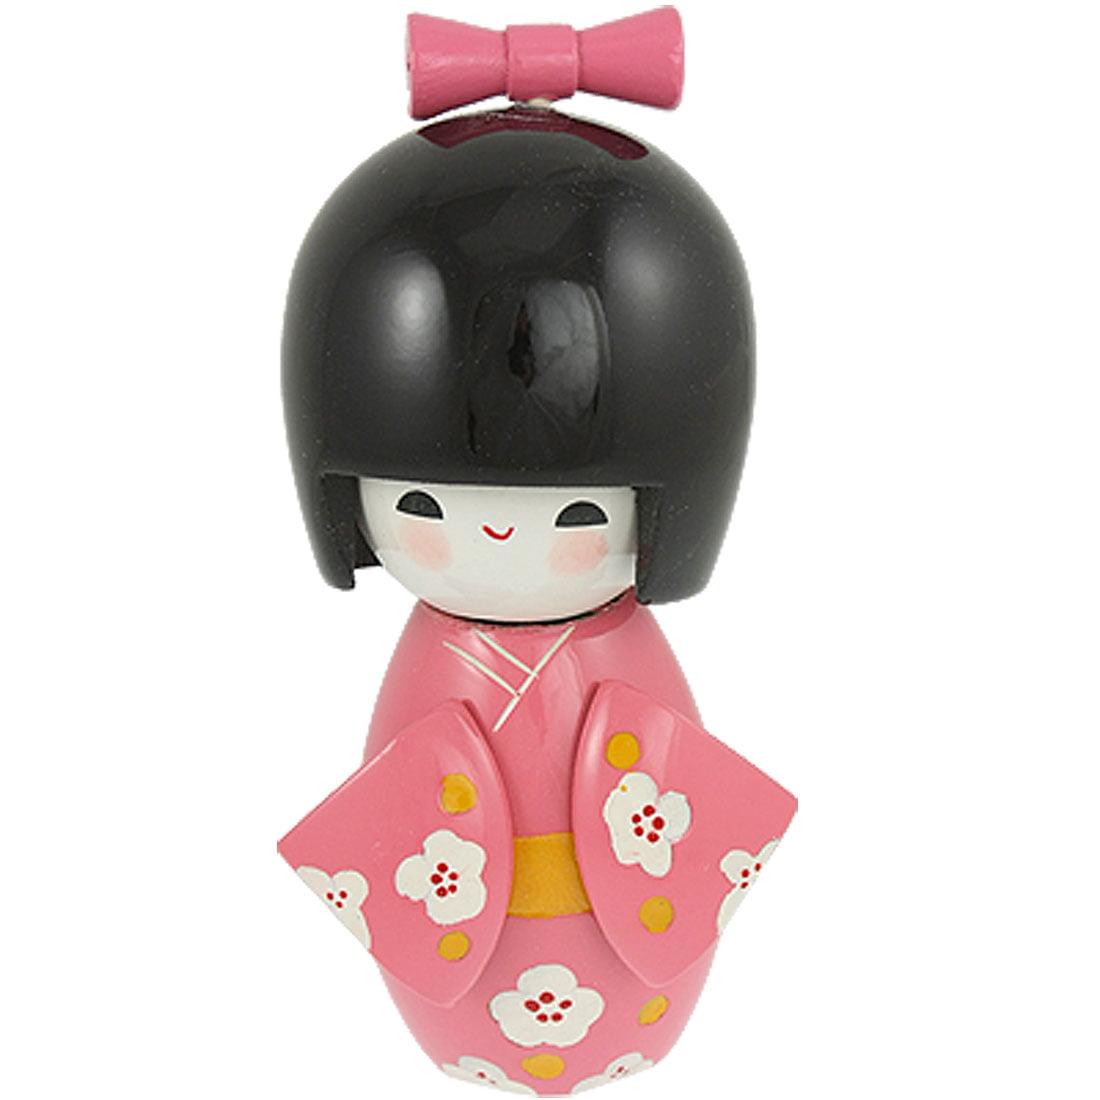 Wooden Bowtie Decor Smiling Girl Pink Kimono Japanese Kokeshi Doll Toy Walmart Com